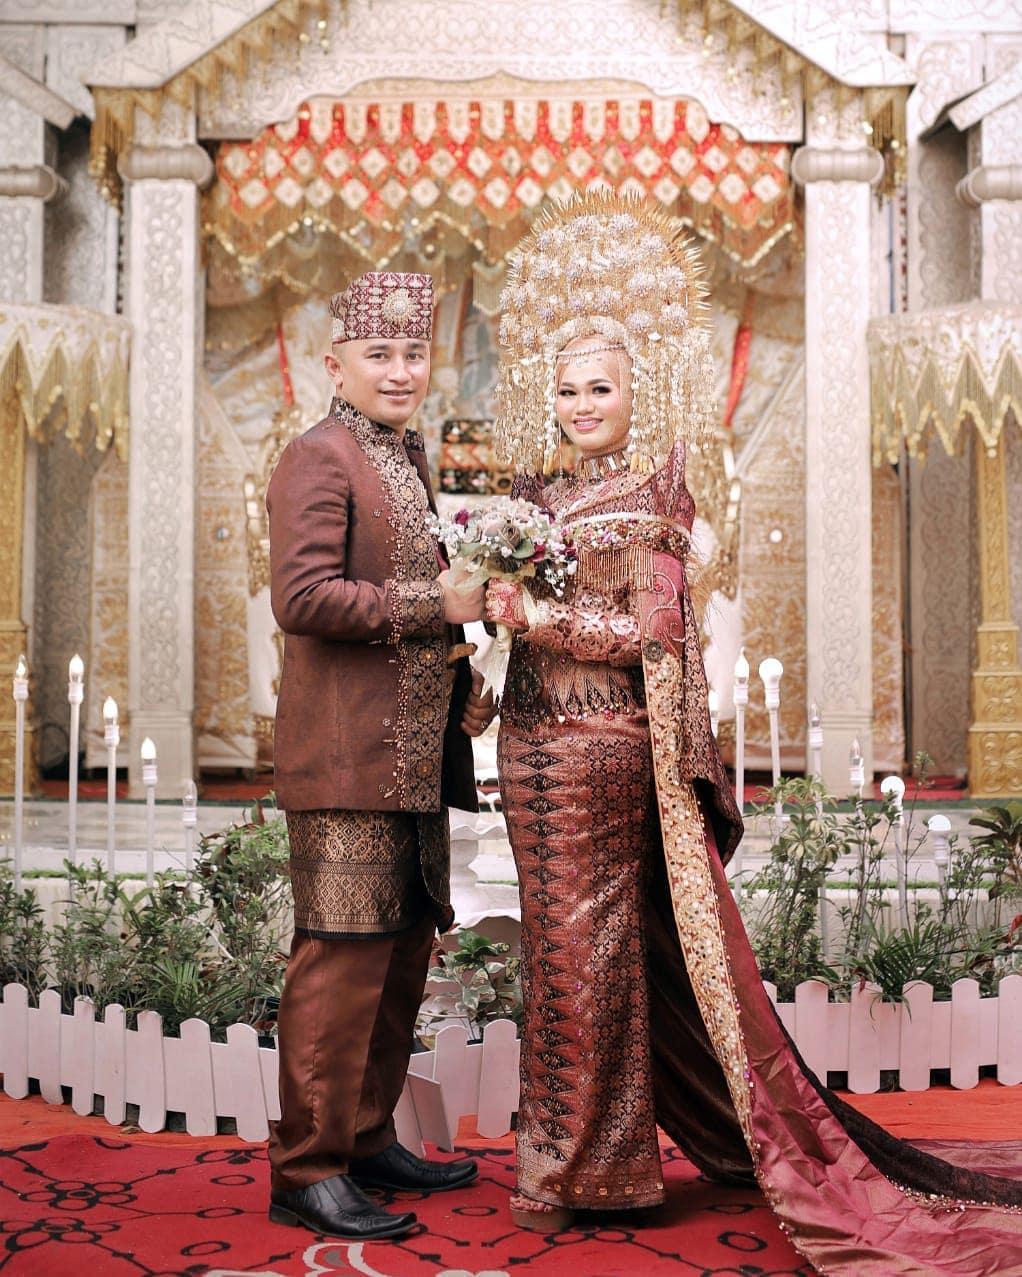 Baju Pengantin Padang Modern dan Islami Terbaik di Padang